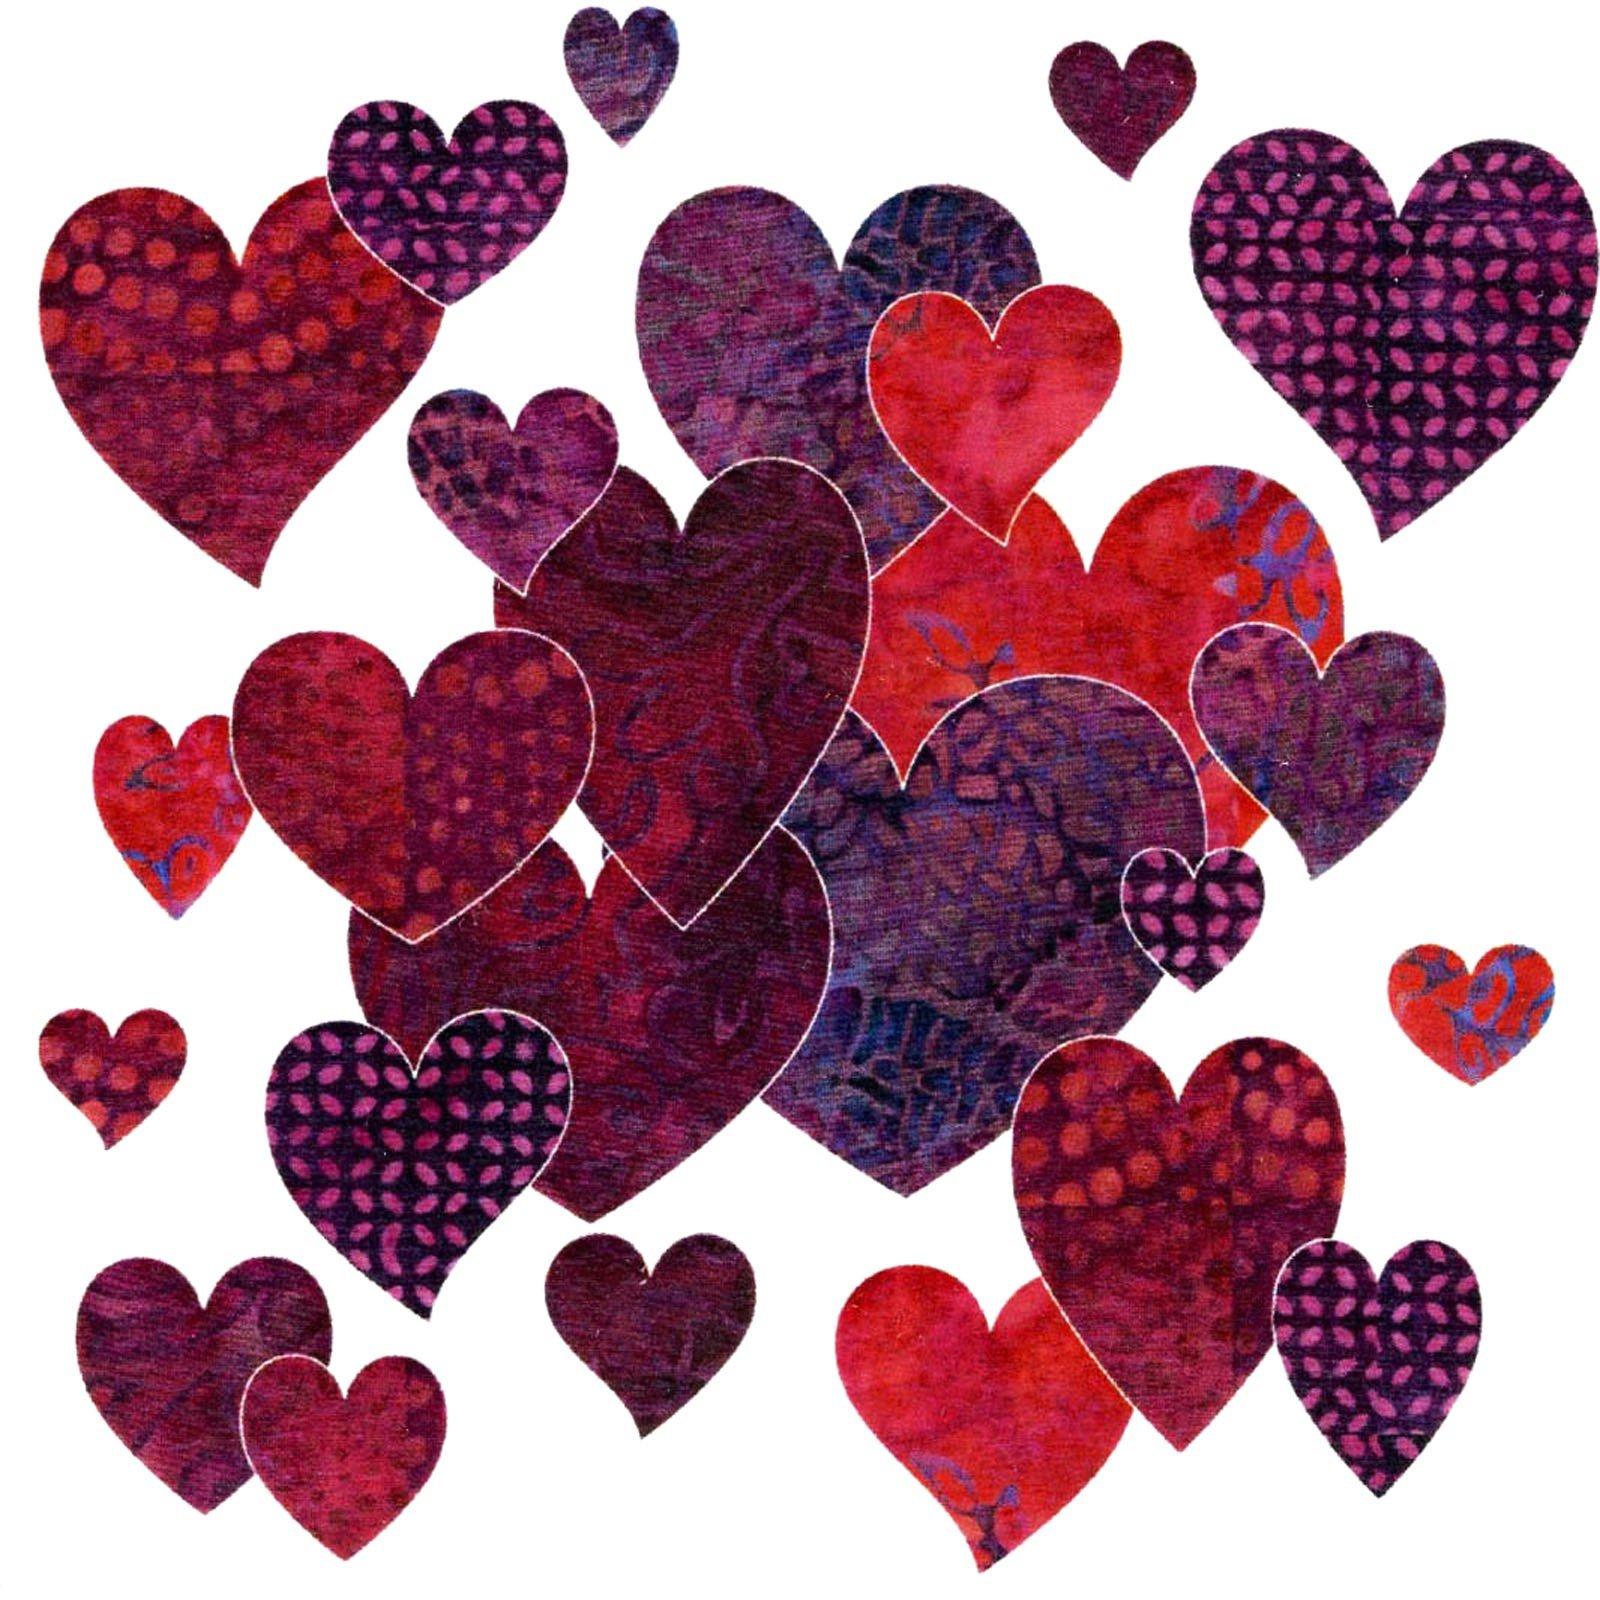 Bohemian Chic Hearts - Fuchsia Batik Set<br/>Applique Elementz 1020